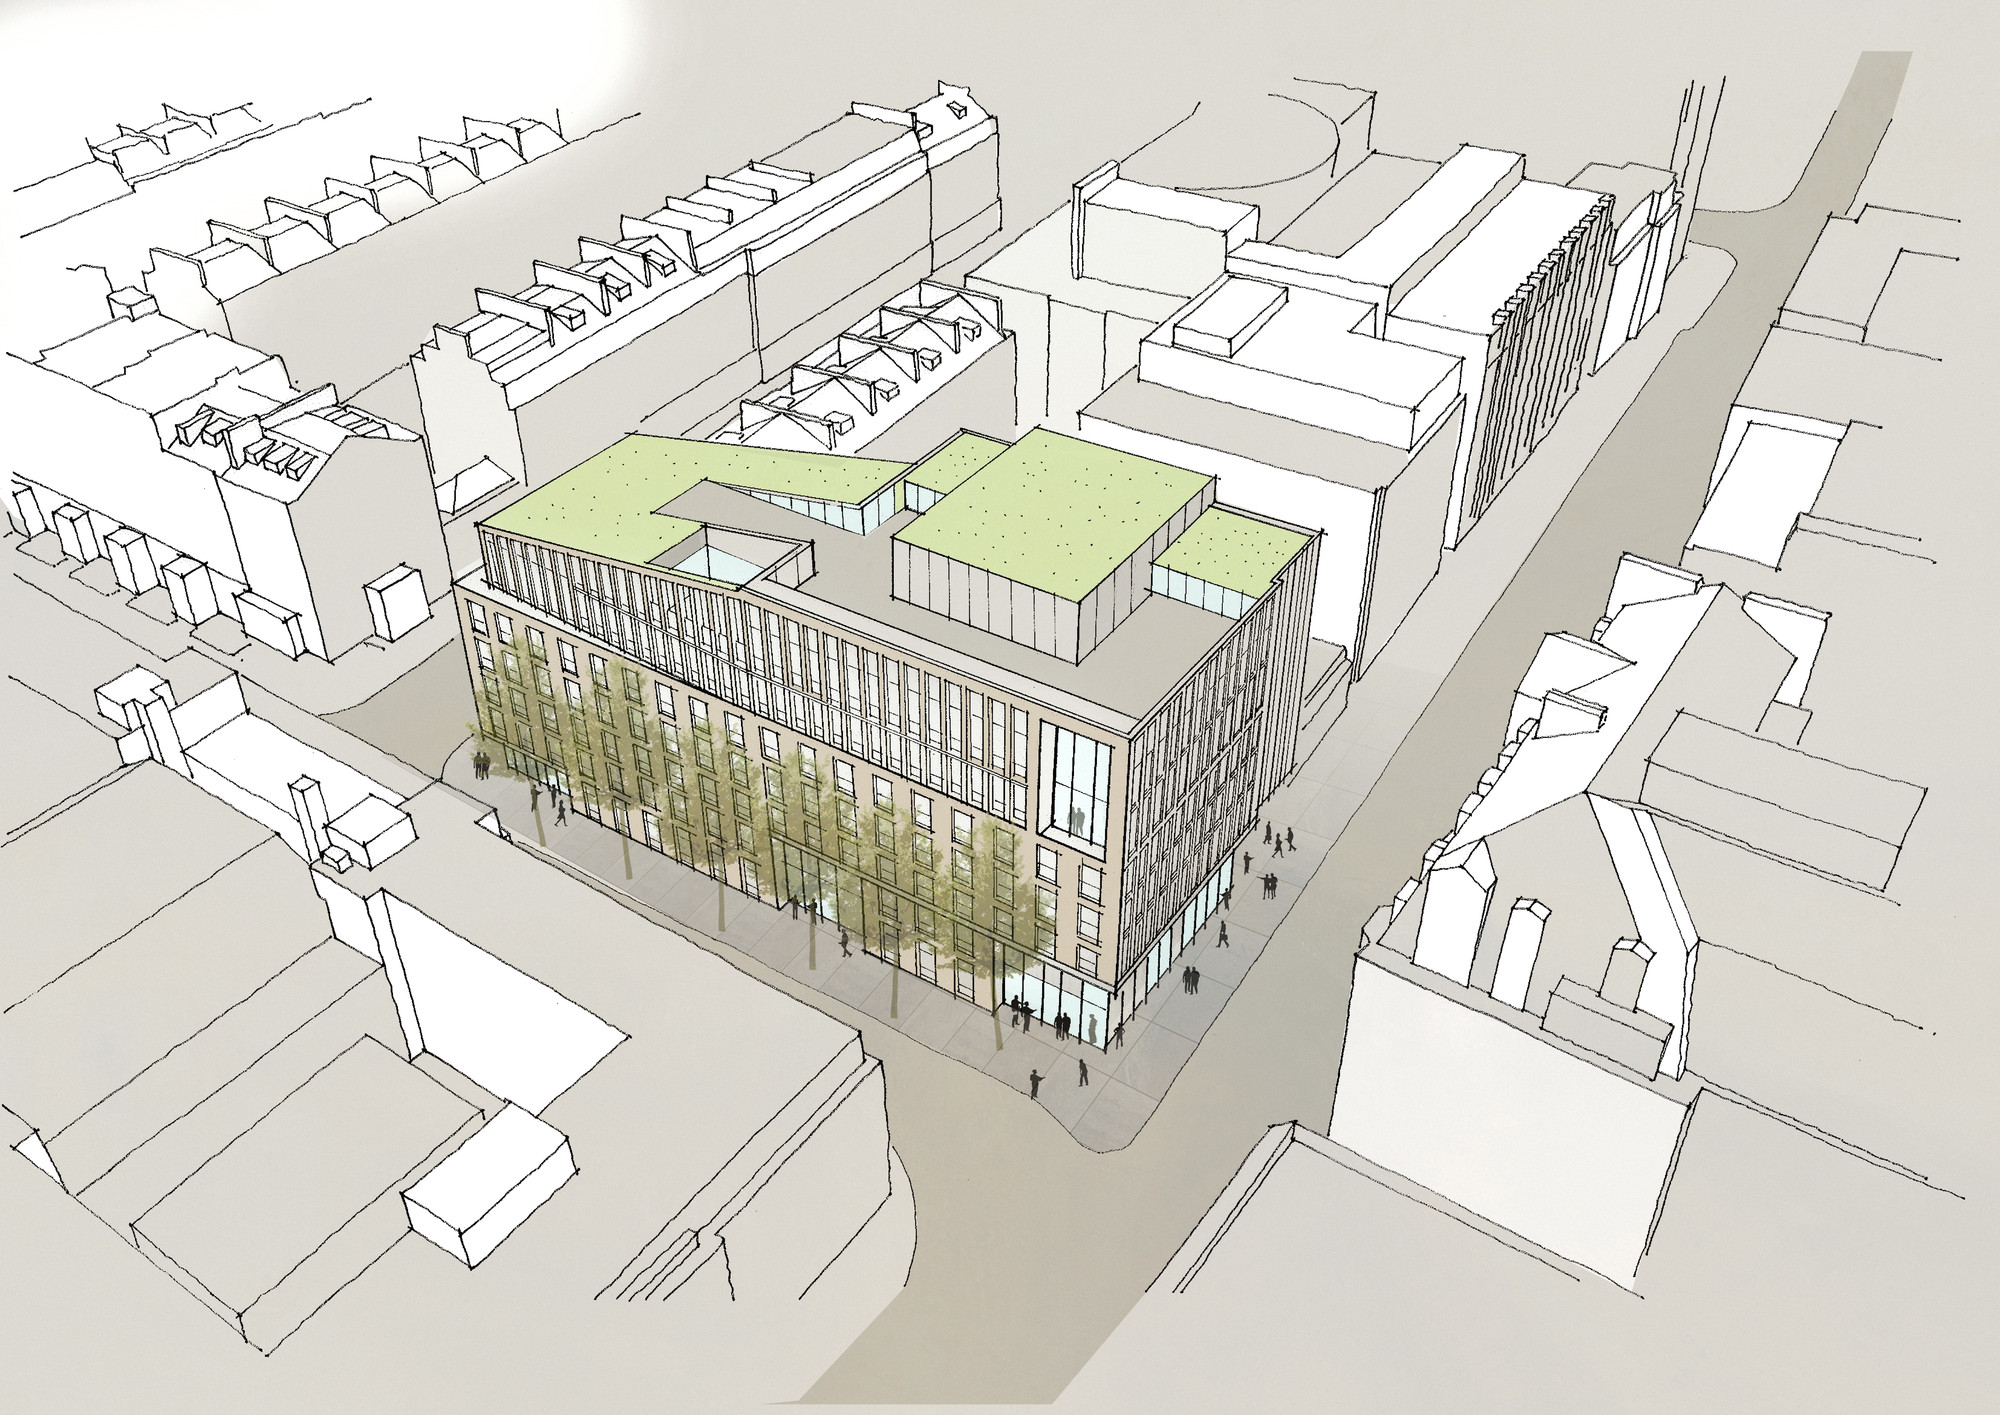 gallery of hawkinsbrown reveal plans for bartlett school revamp - 4